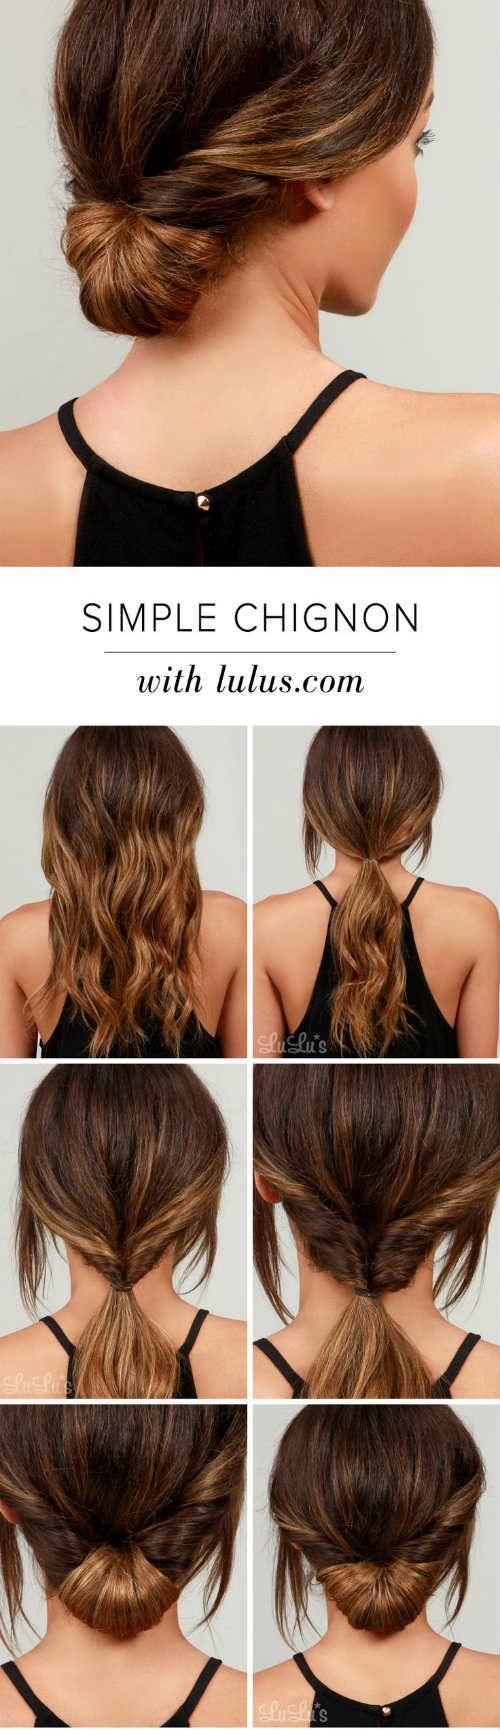 best hair u makeÜp images on pinterest hair ideas hairstyle